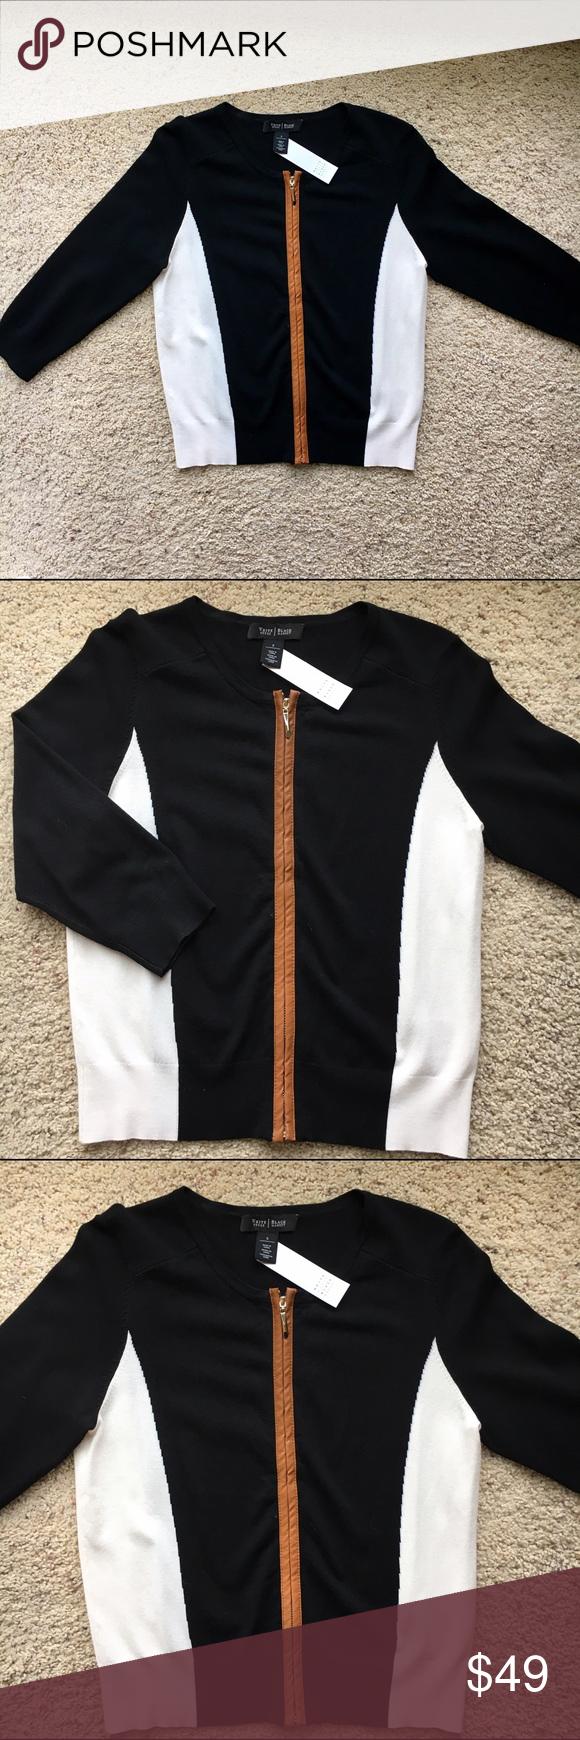 WHBM ZIP UP CARDIGAN White House black market zip up cardigan with tan leather trim. NWT White House Black Market Sweaters Cardigans